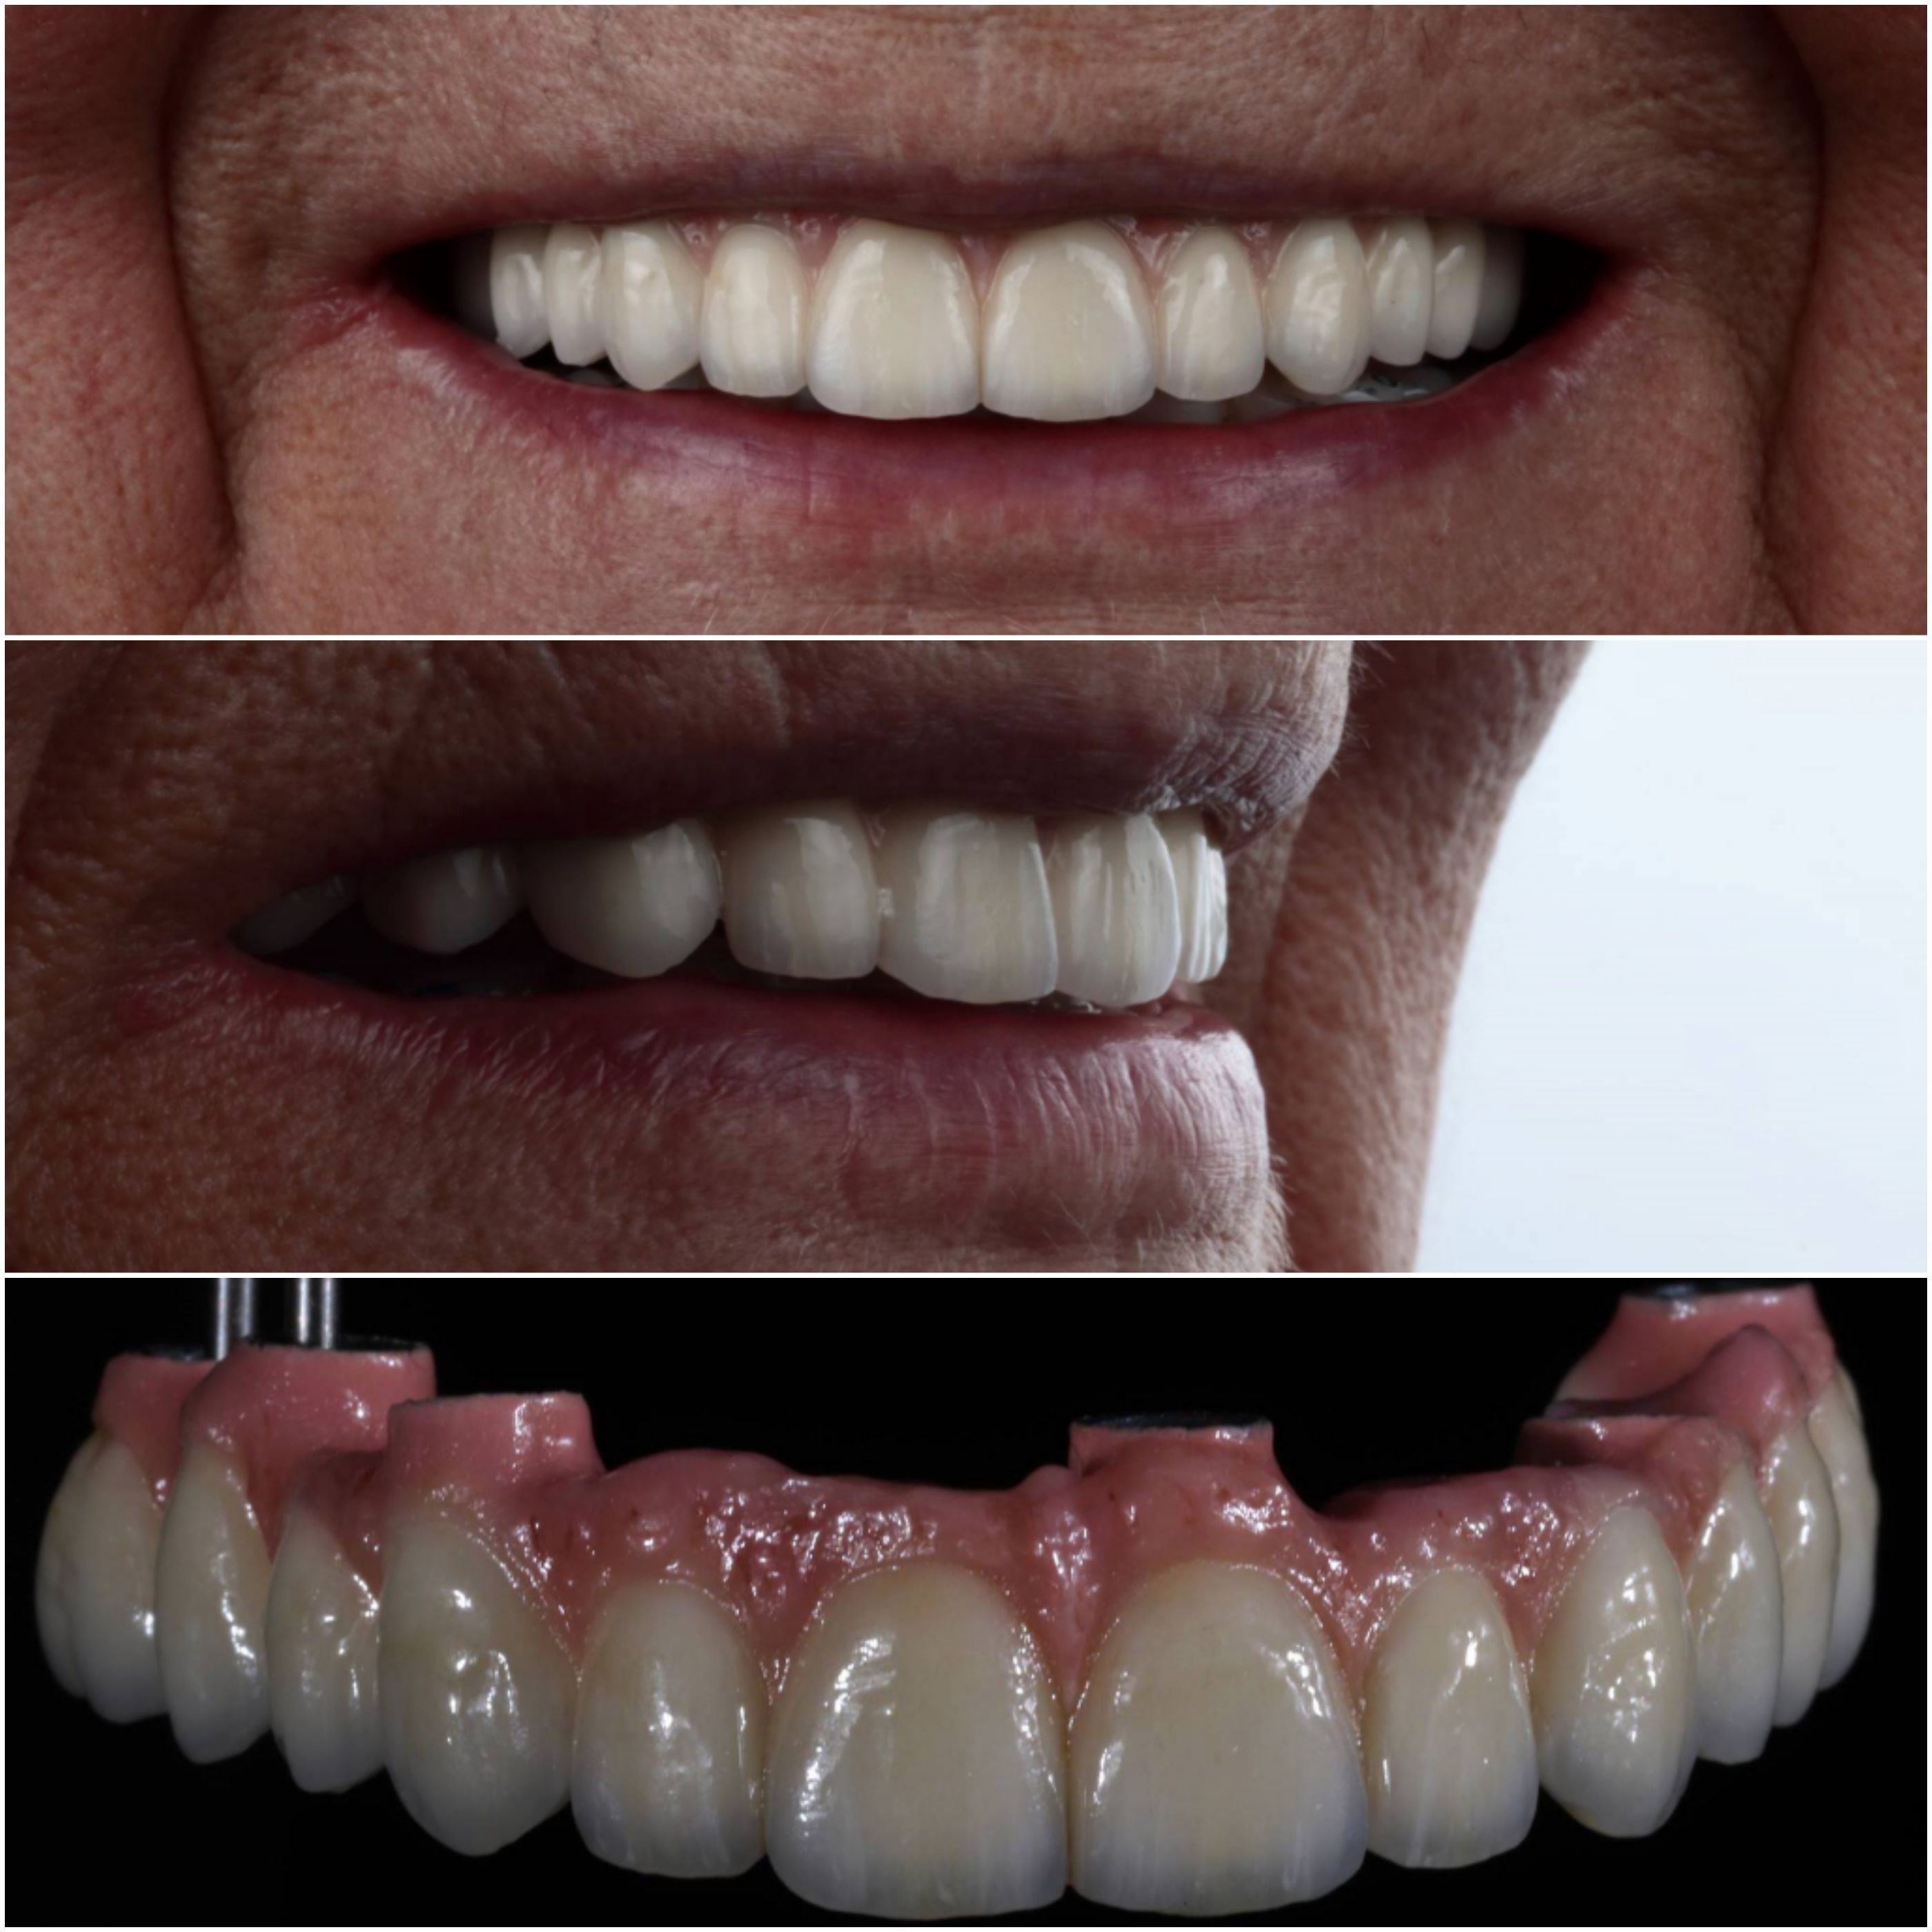 Unaccountable Dental Implants Cost Dr Who Toothpaste Dentalimplantsbeforeandafterwebsite Dental Ceramics Dental Implants Cost Teeth Implants